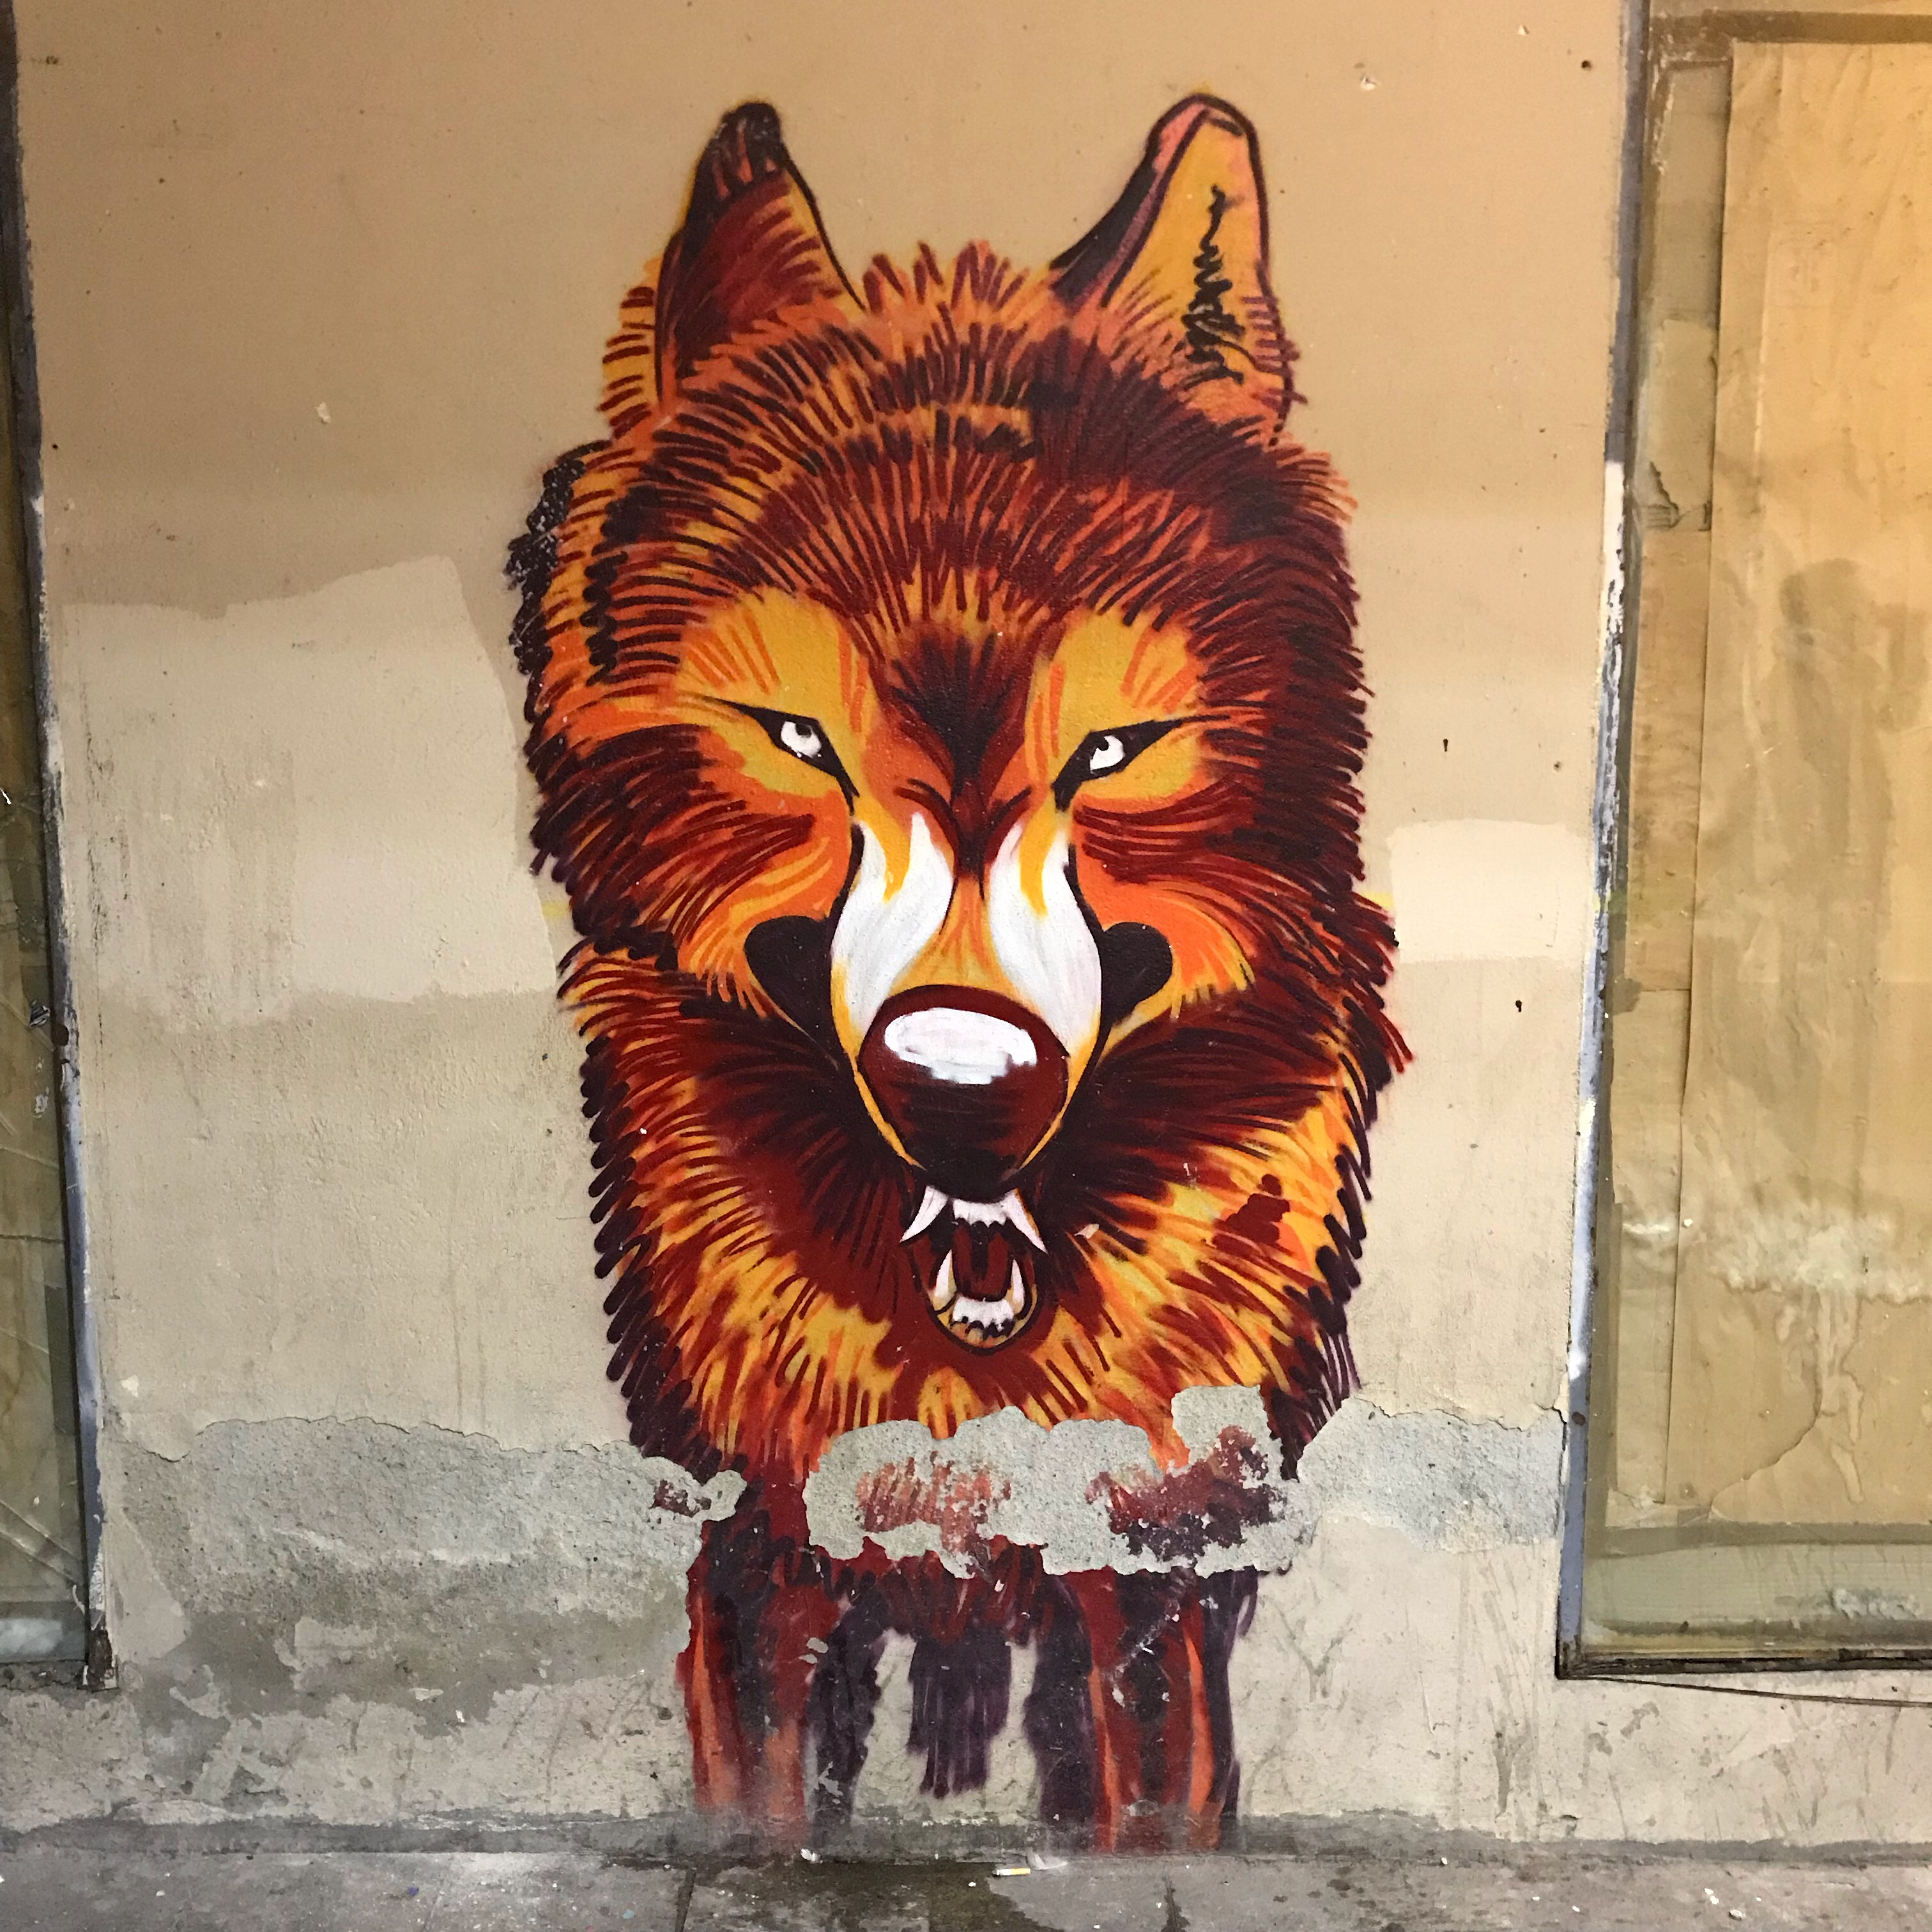 Streetart Barcelona – Hungry like the wolf (1982)